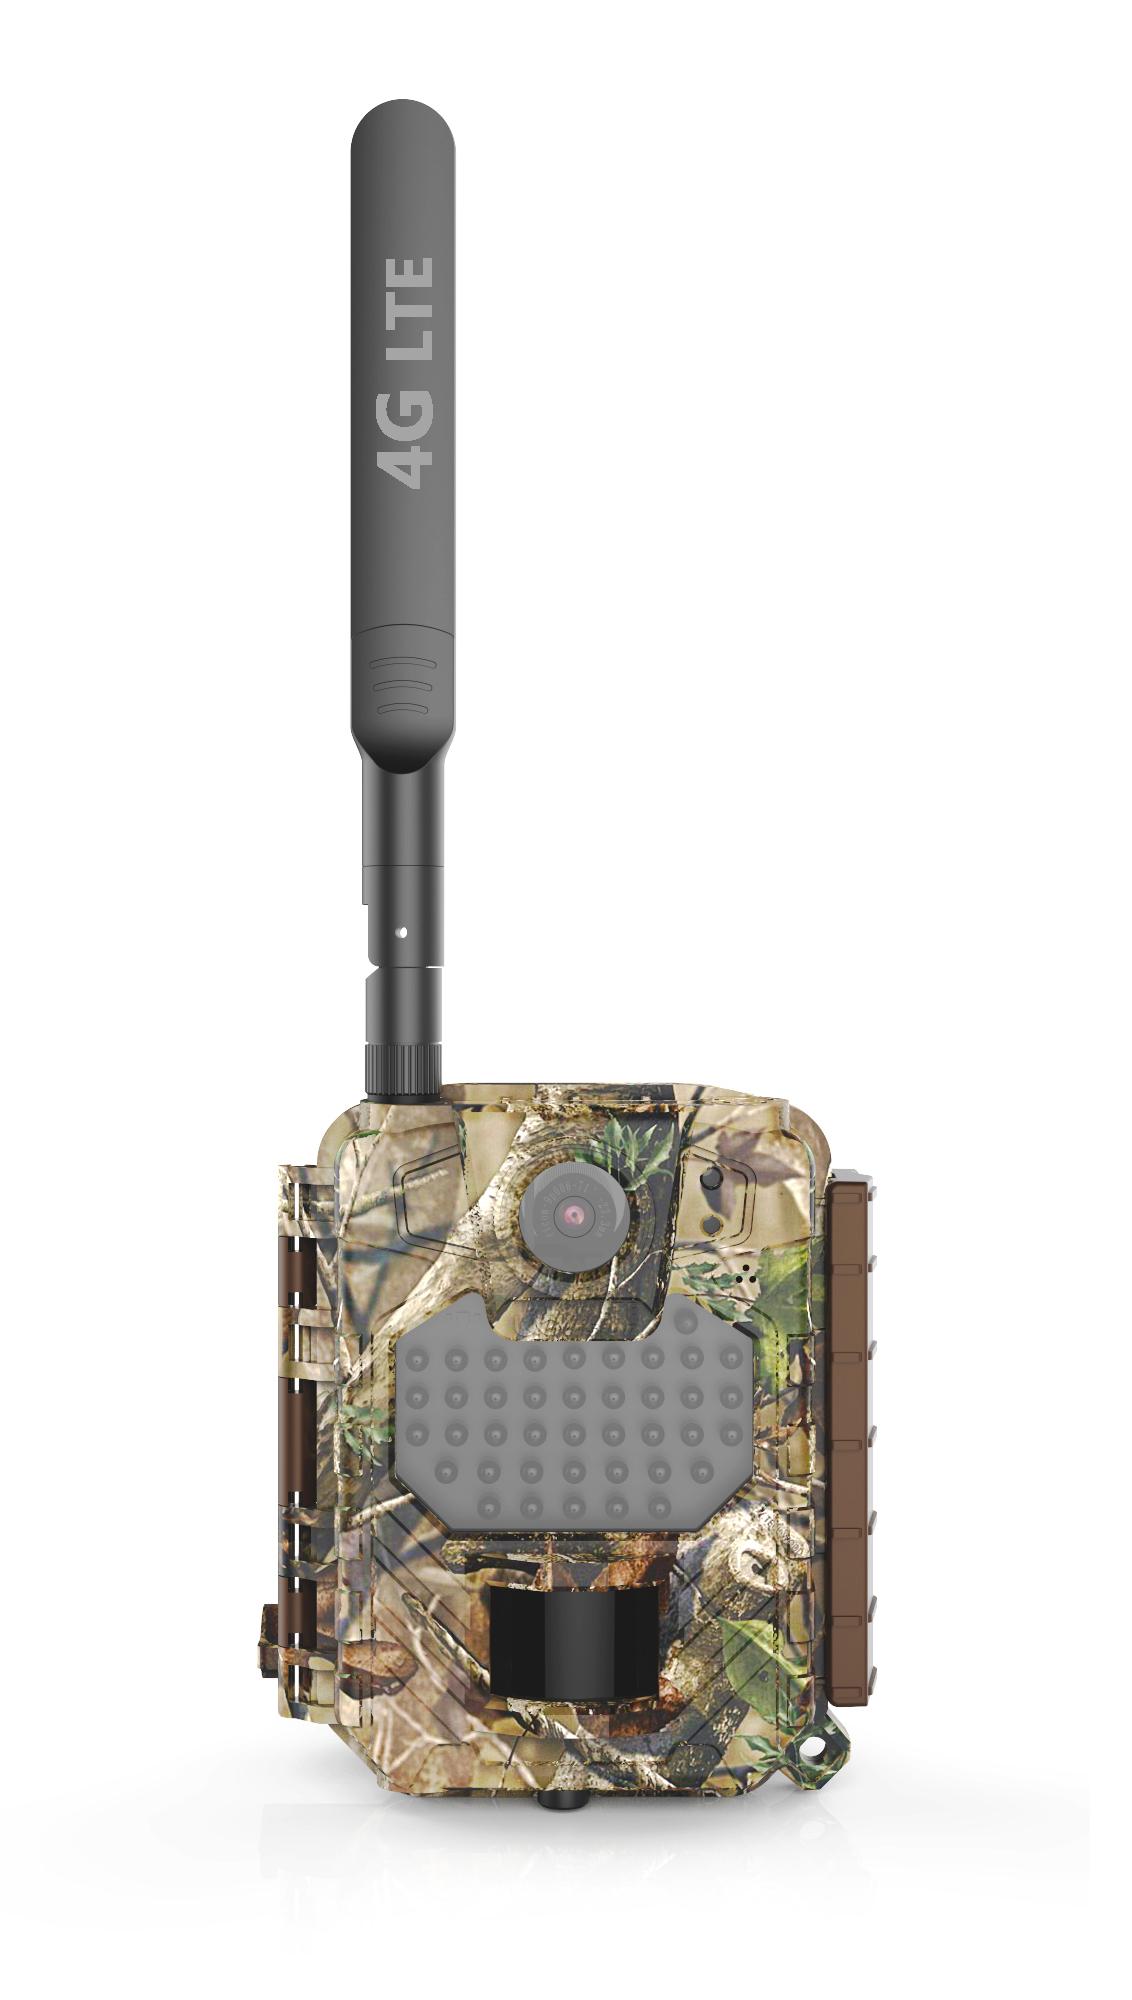 Åtelkamera UOVision Compact LTE/4G 20mp - Cloud-App